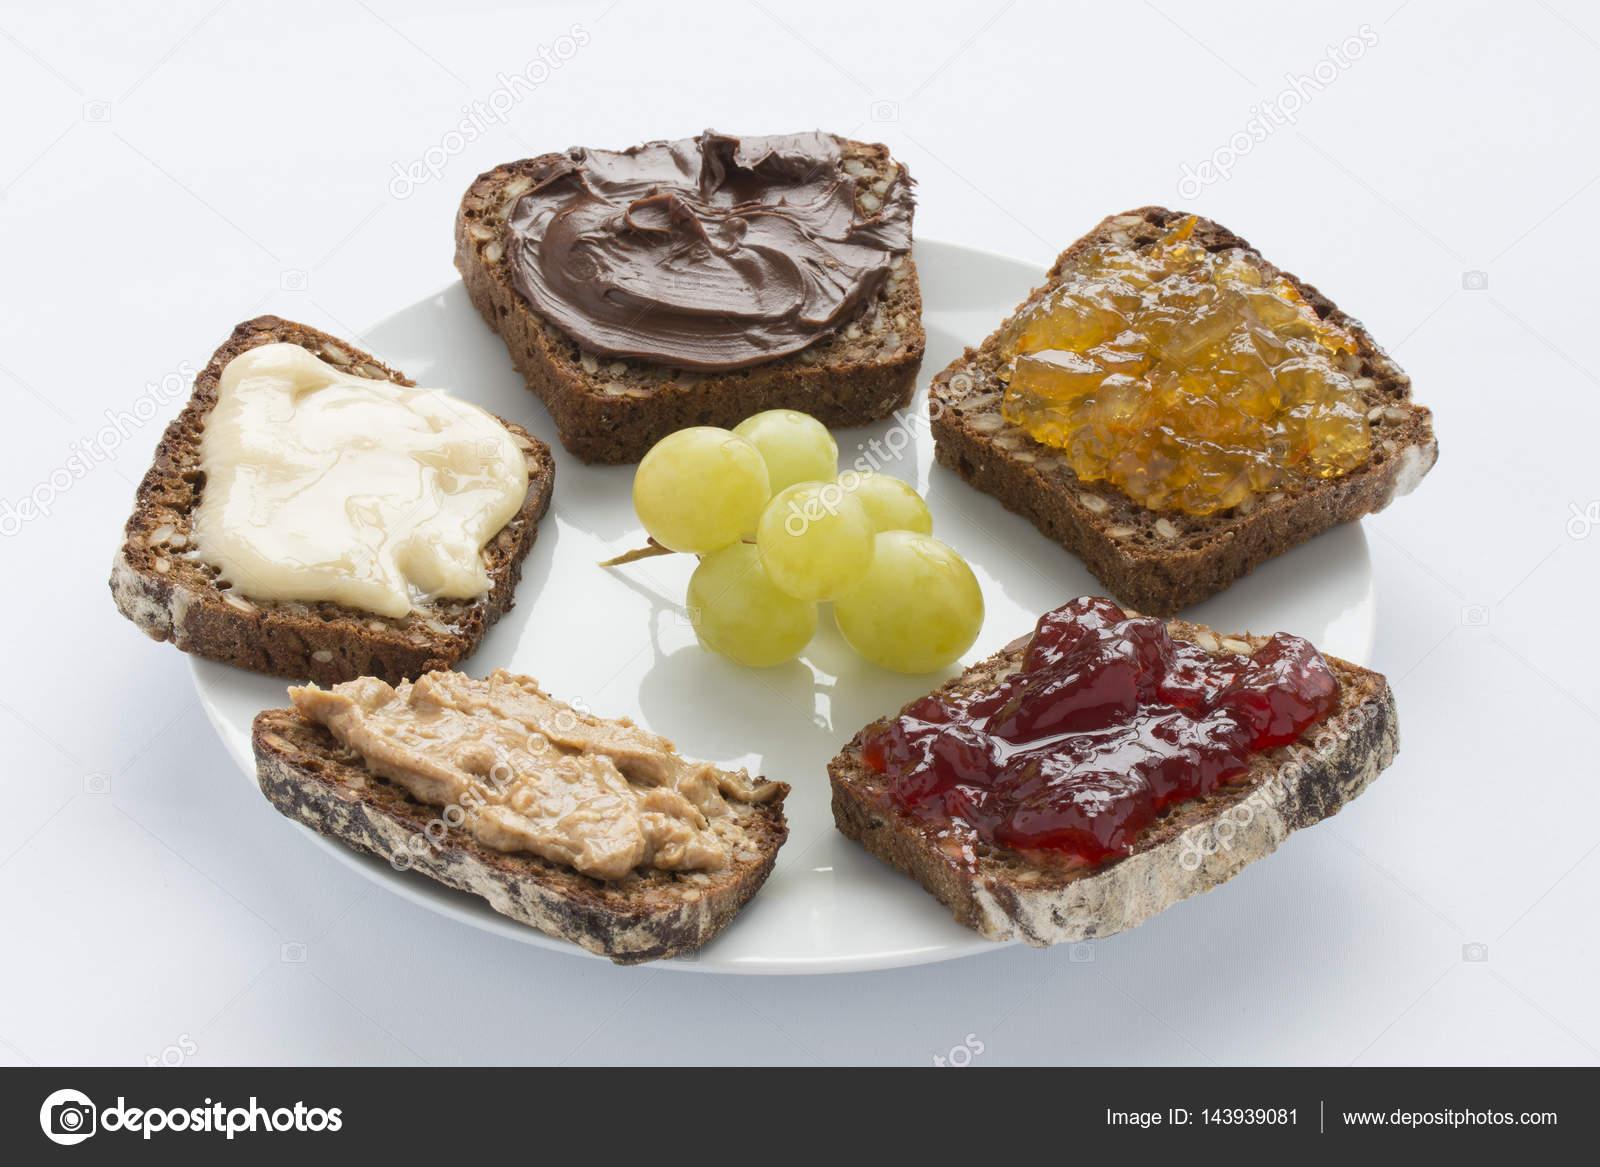 Panini dolci per il pranzo u foto stock krzysztof syrek atom